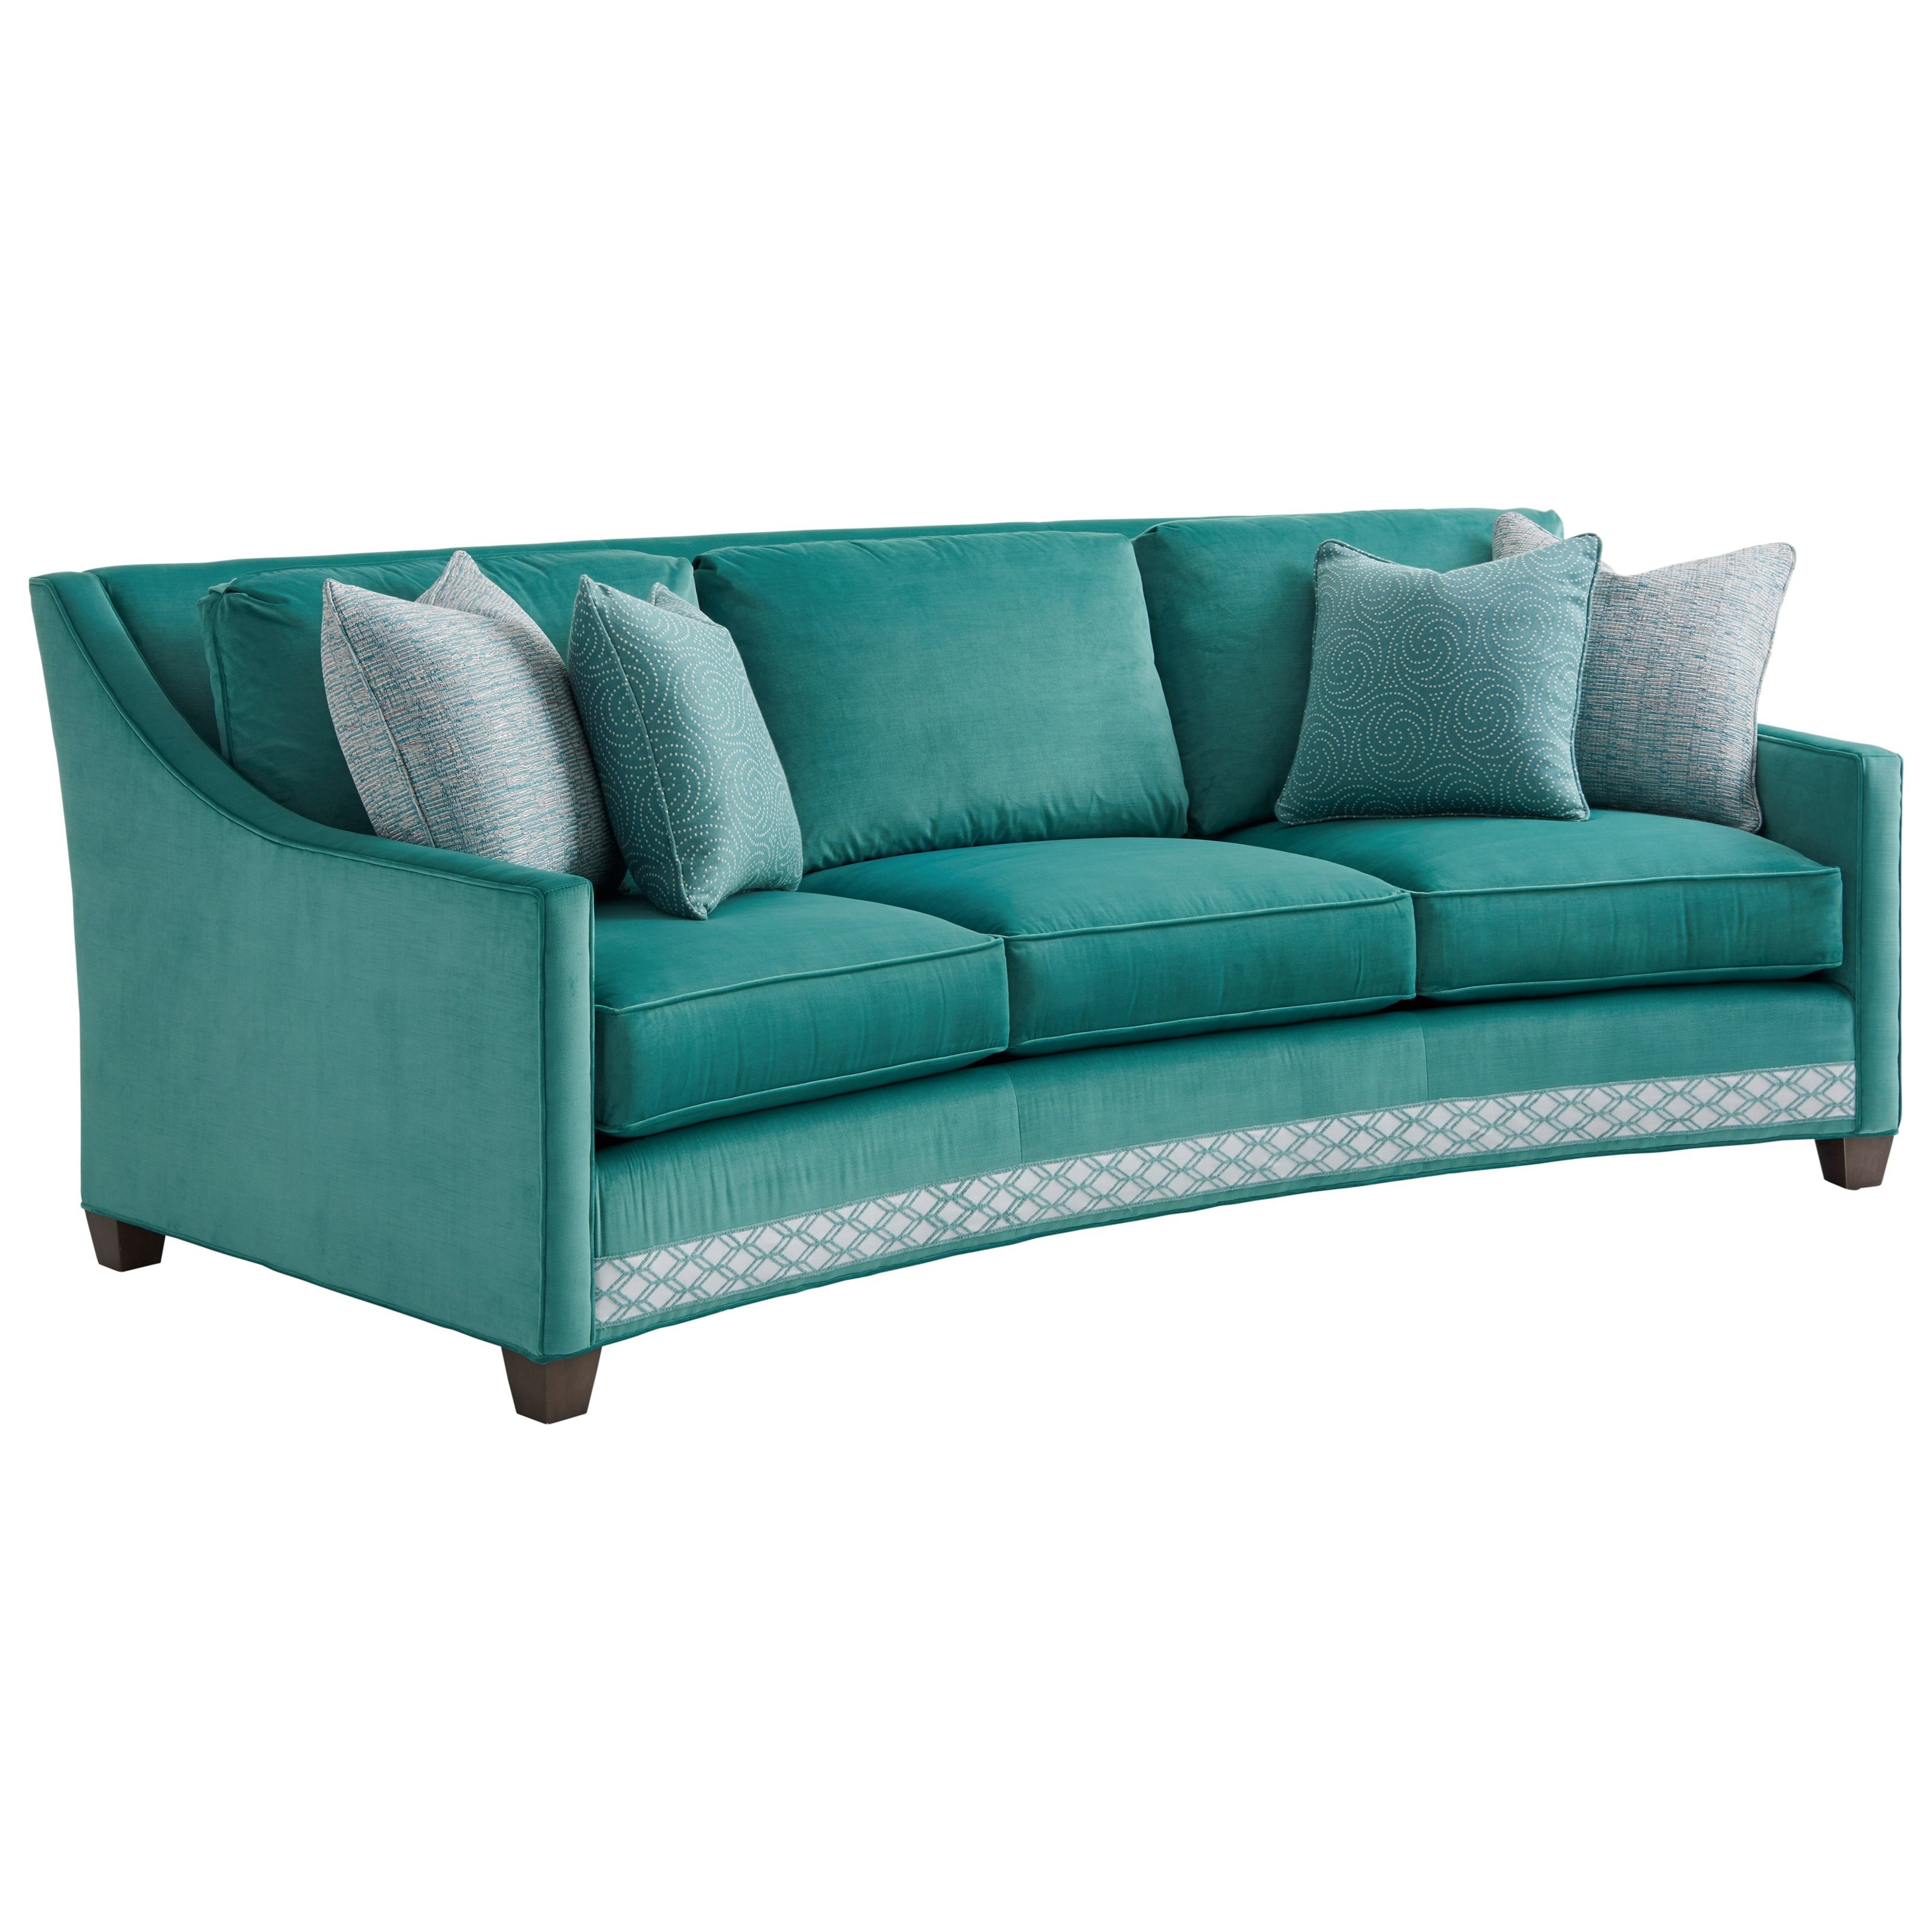 conversational sofa cover tan leather bed australia lexington ariana 7931 33 valenza curved john v